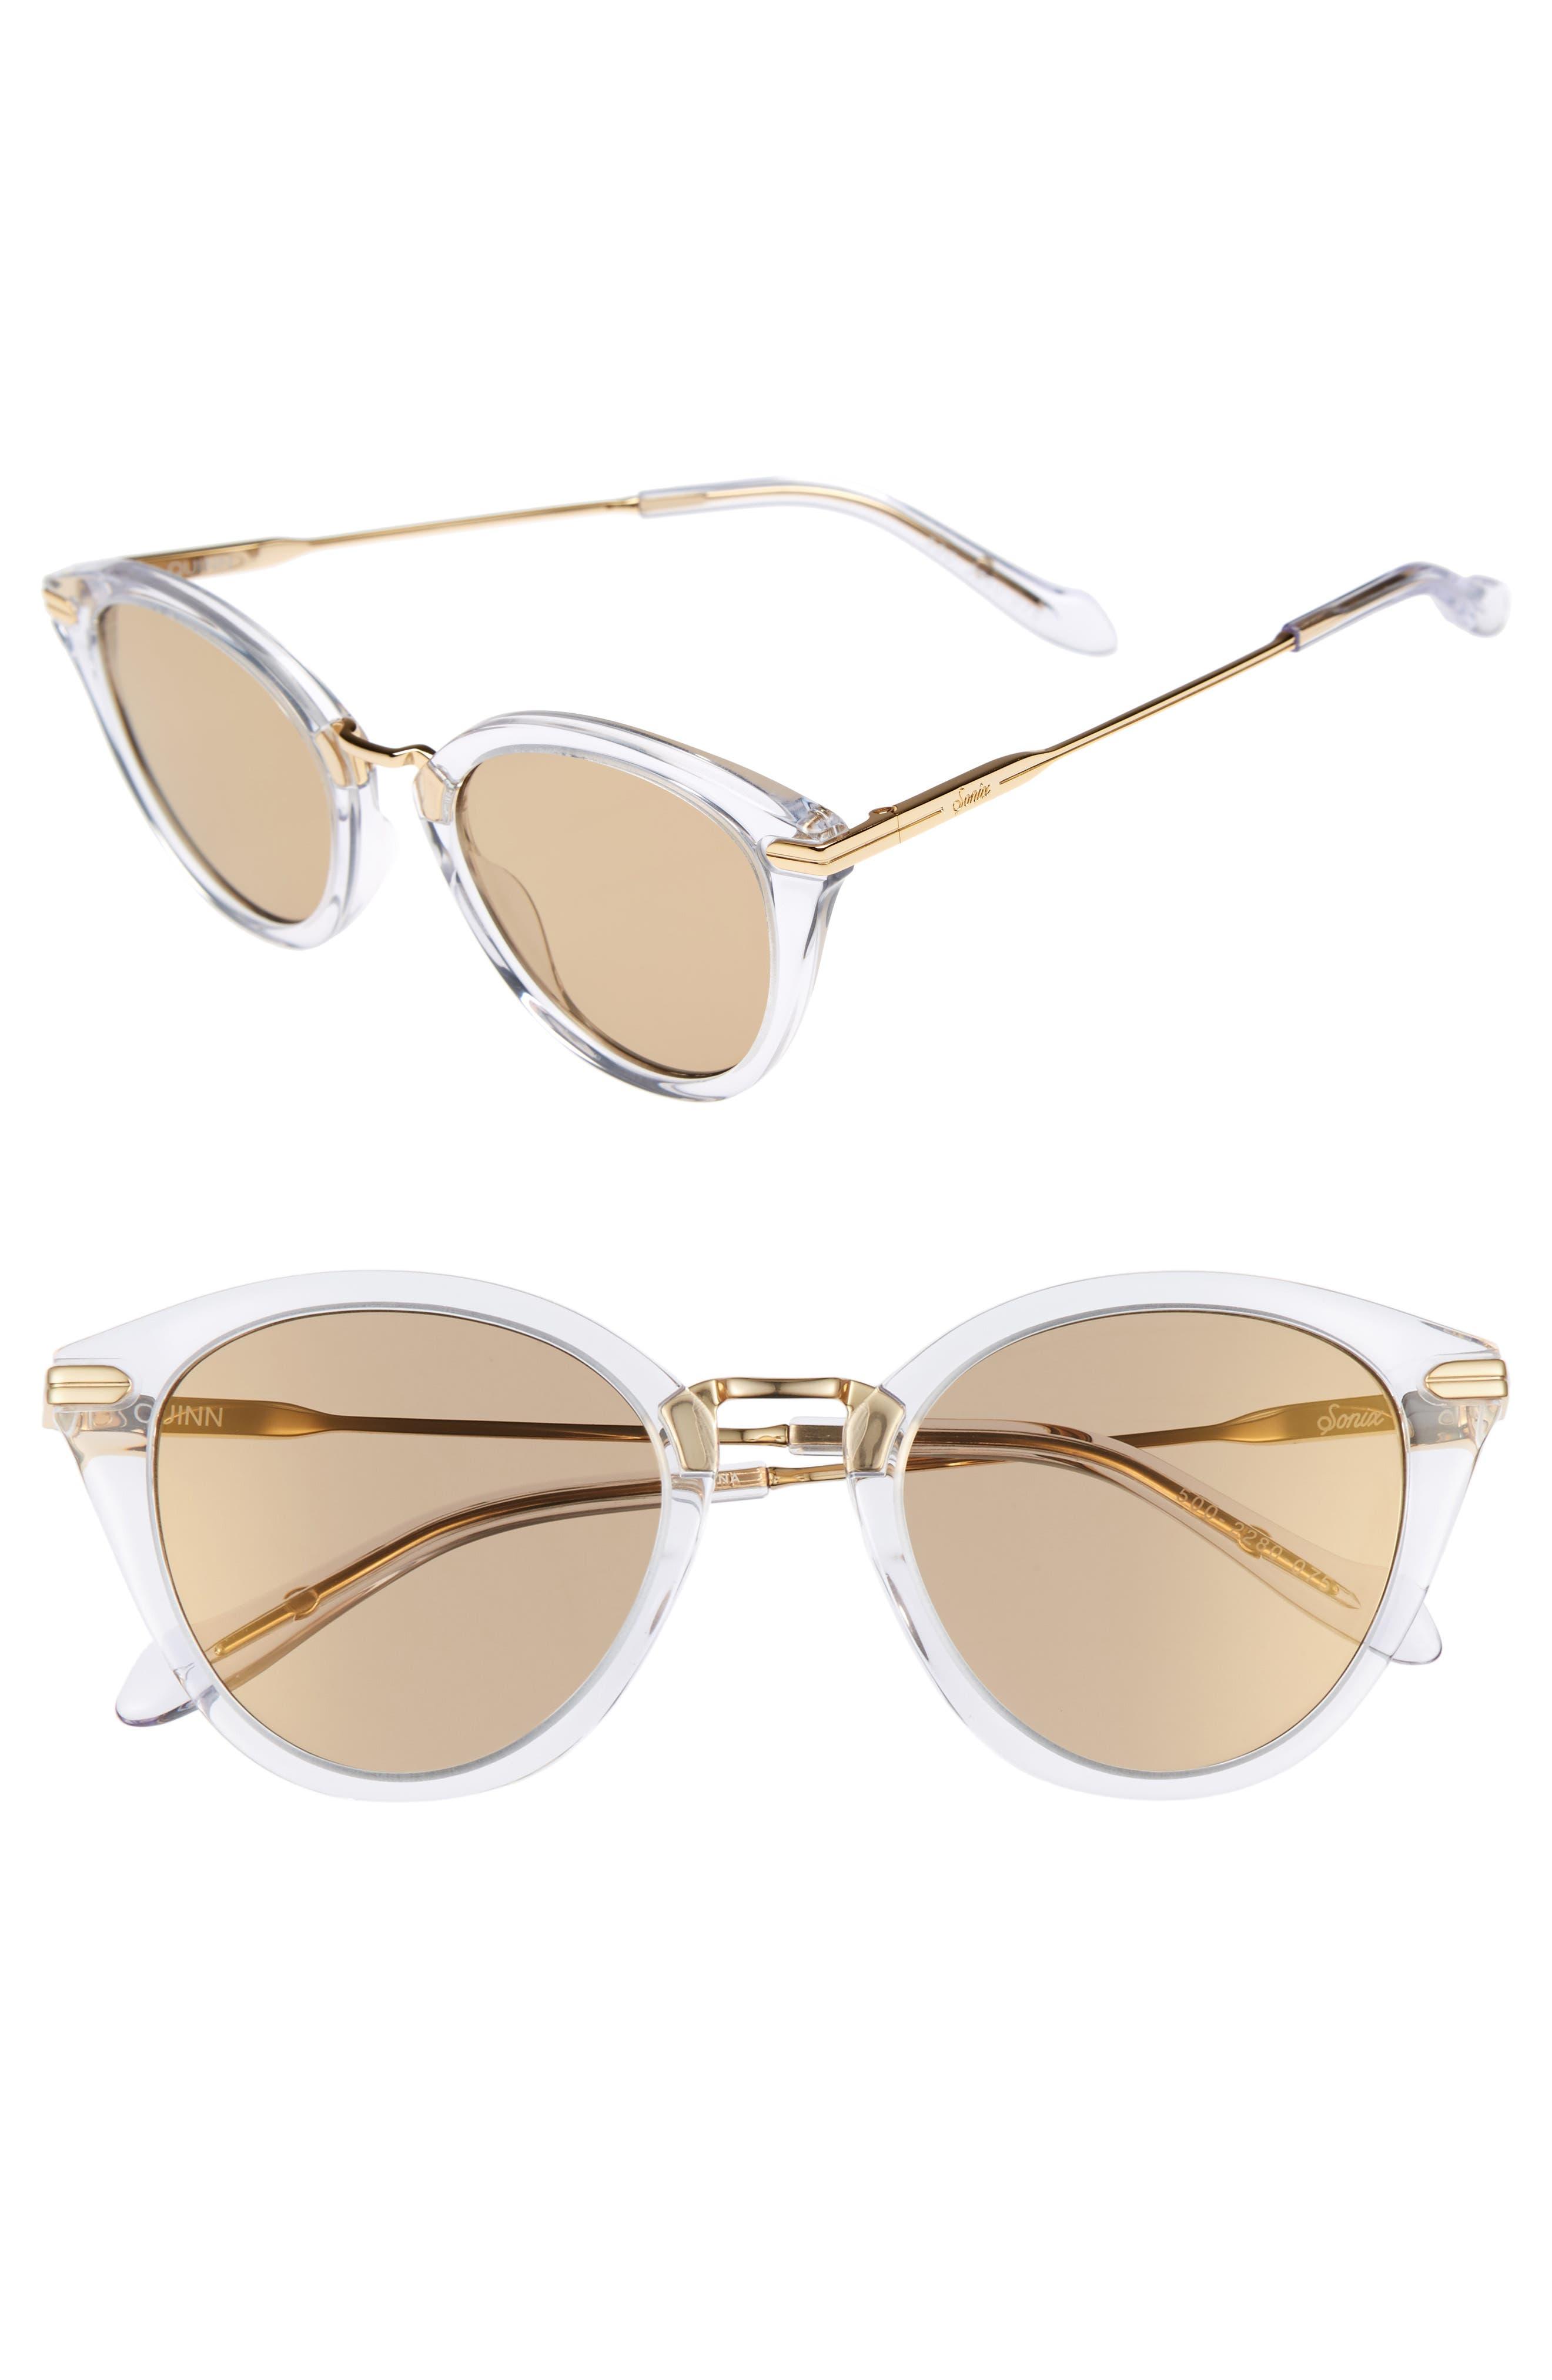 Quinn 48mm Cat Eye Sunglasses,                         Main,                         color, Clear/ Amber Mirror